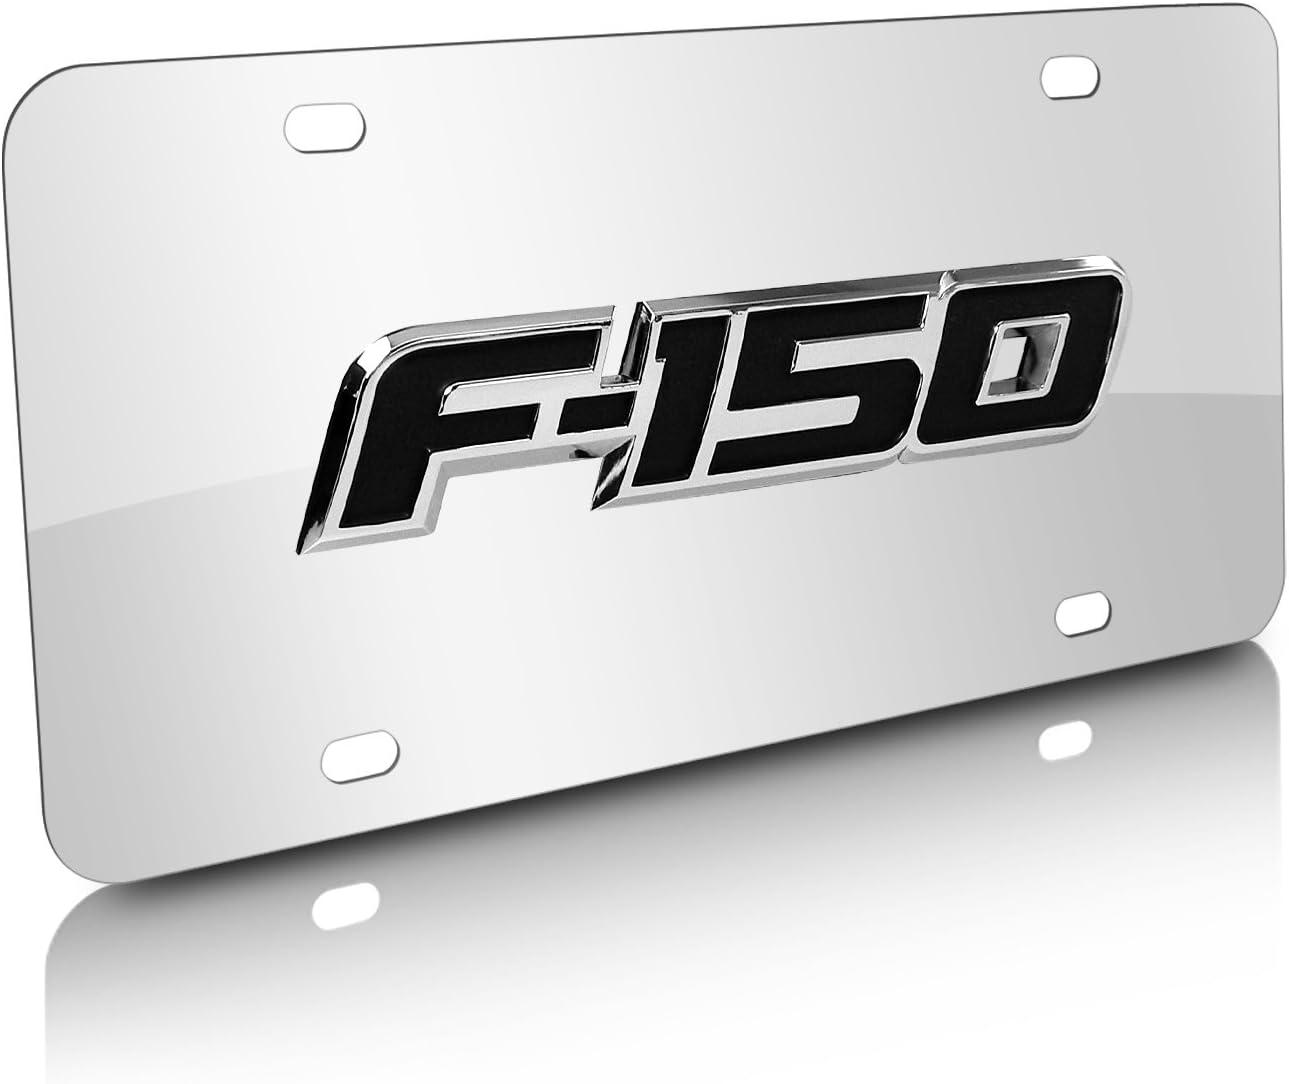 Officially Licensed Chrome Ford F-150 Name on Chrome License Plate